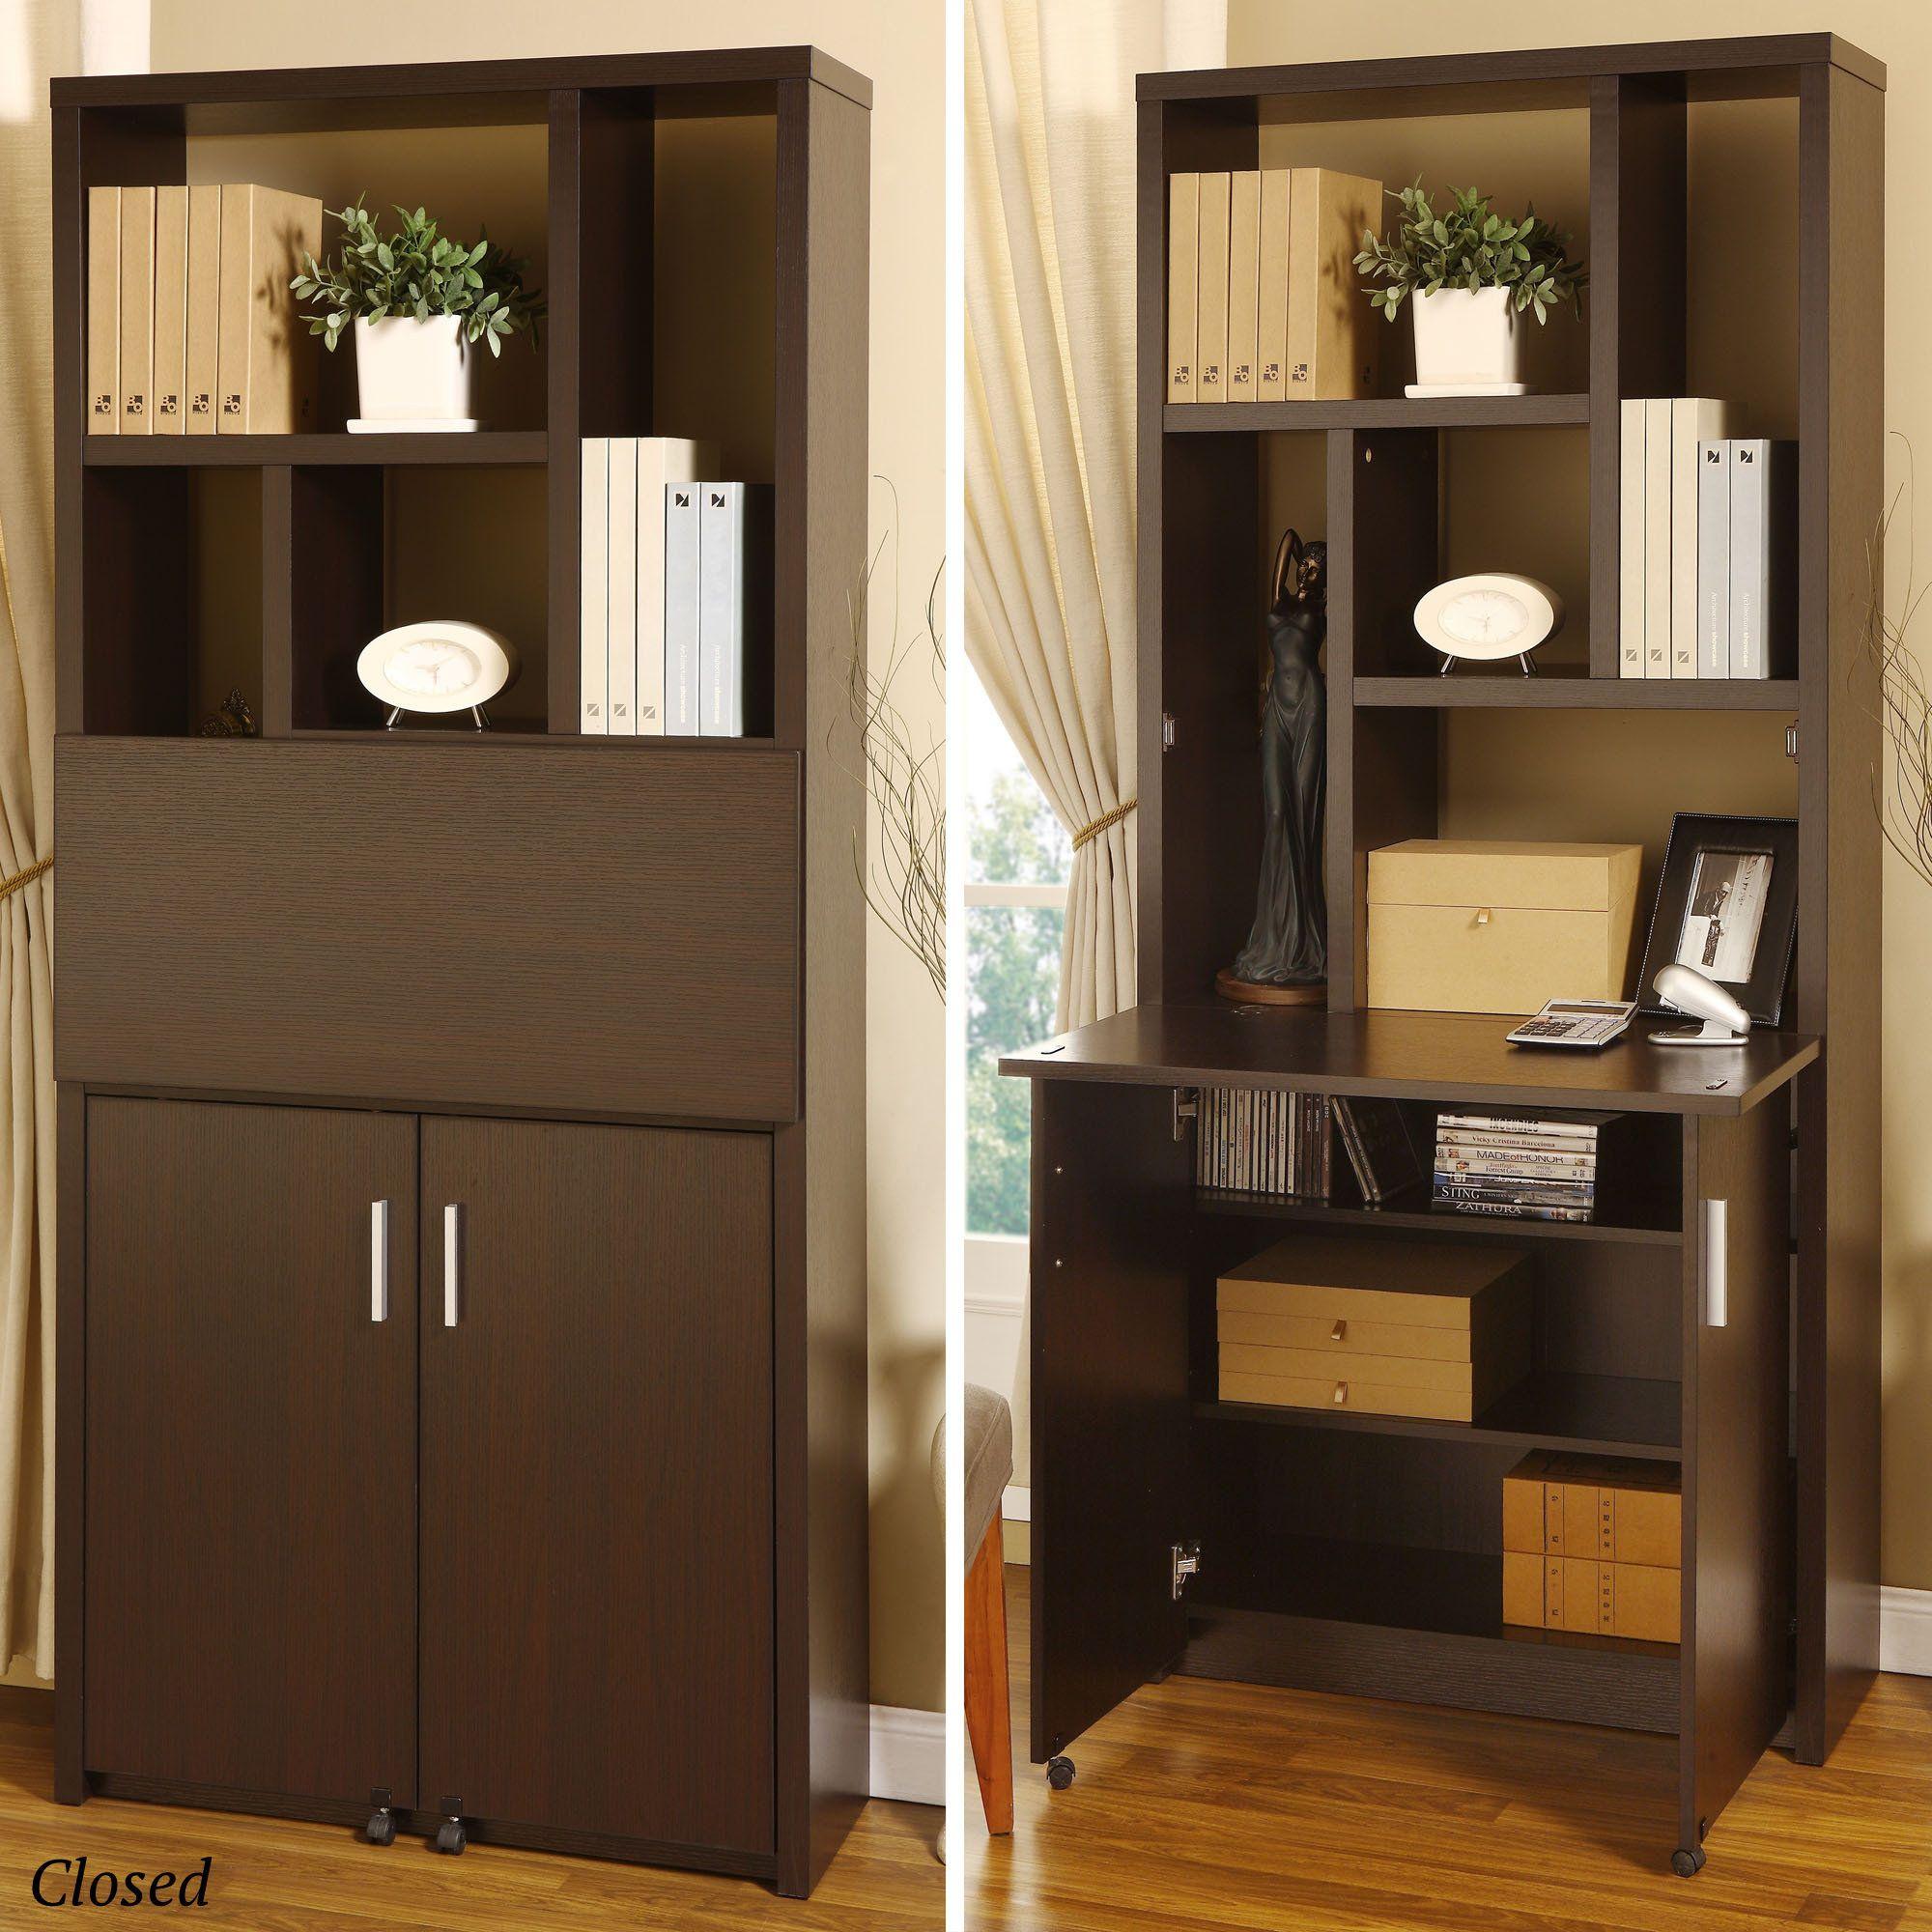 This Would Be A Great Idea For Living Room Cabinets Jens Bookshelf Workstation Espresso Desks For Small Spaces Bookshelf Desk Ikea Desk